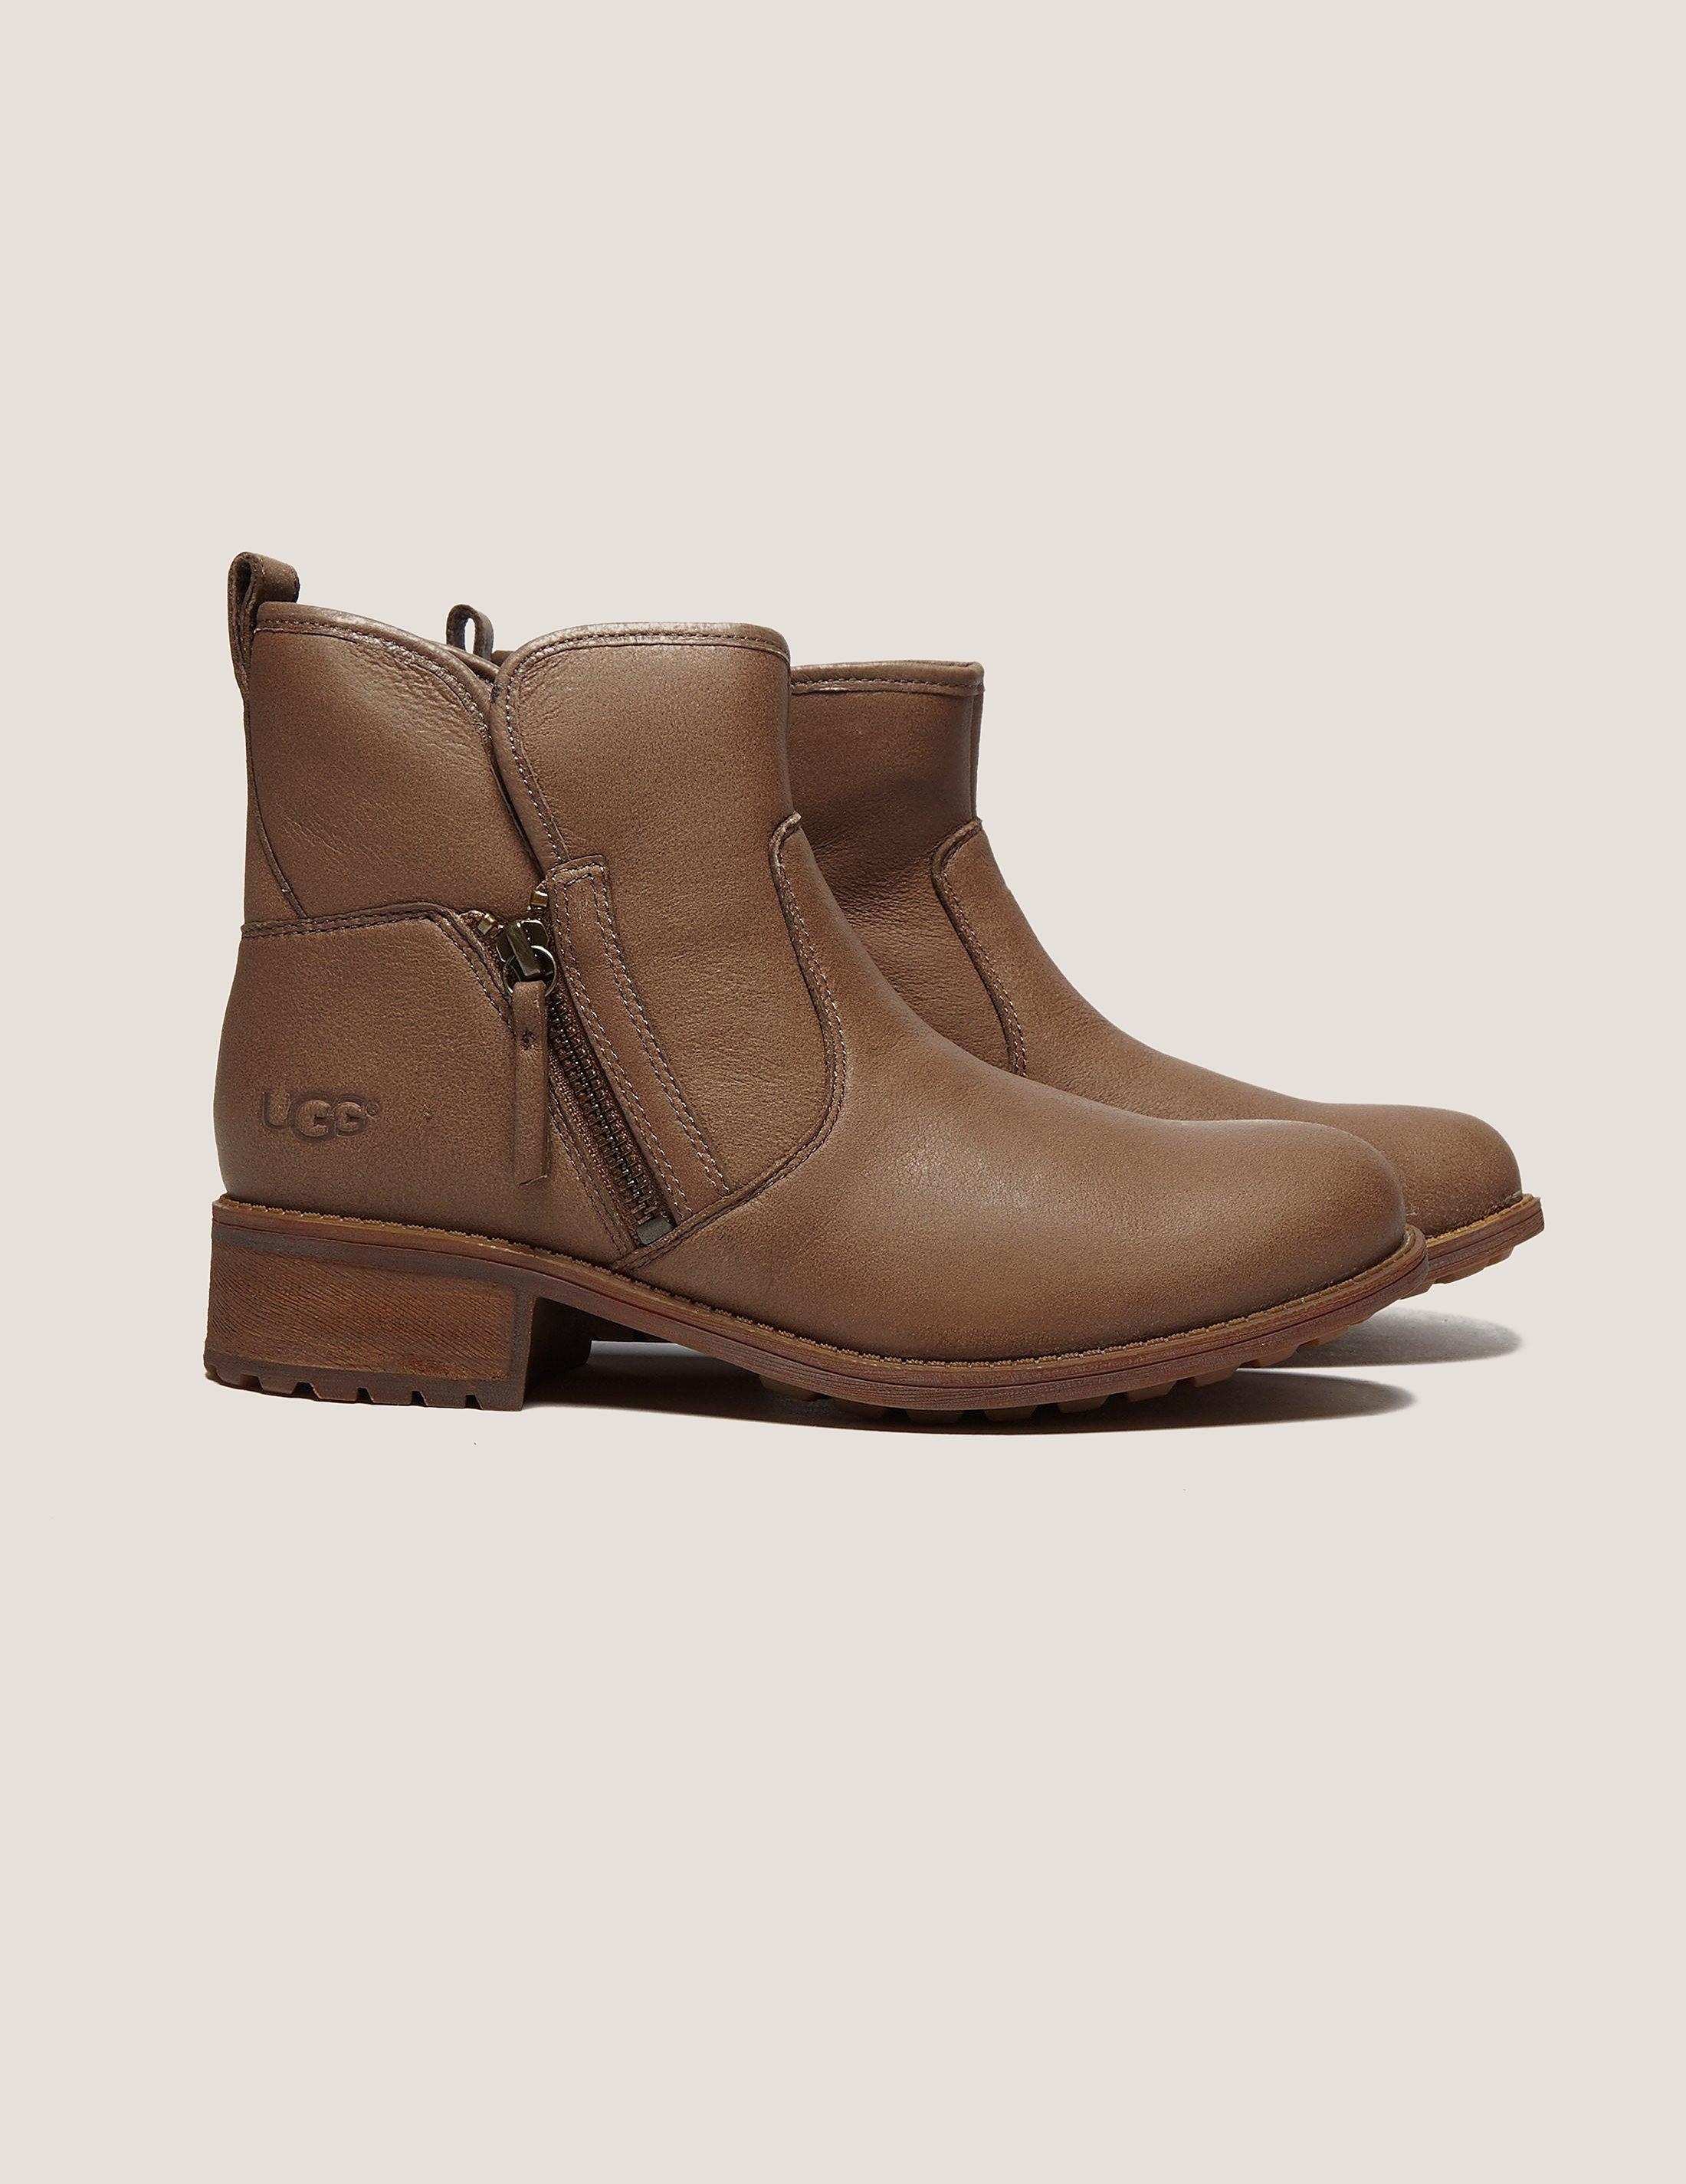 UGG Lavelle Short Boot